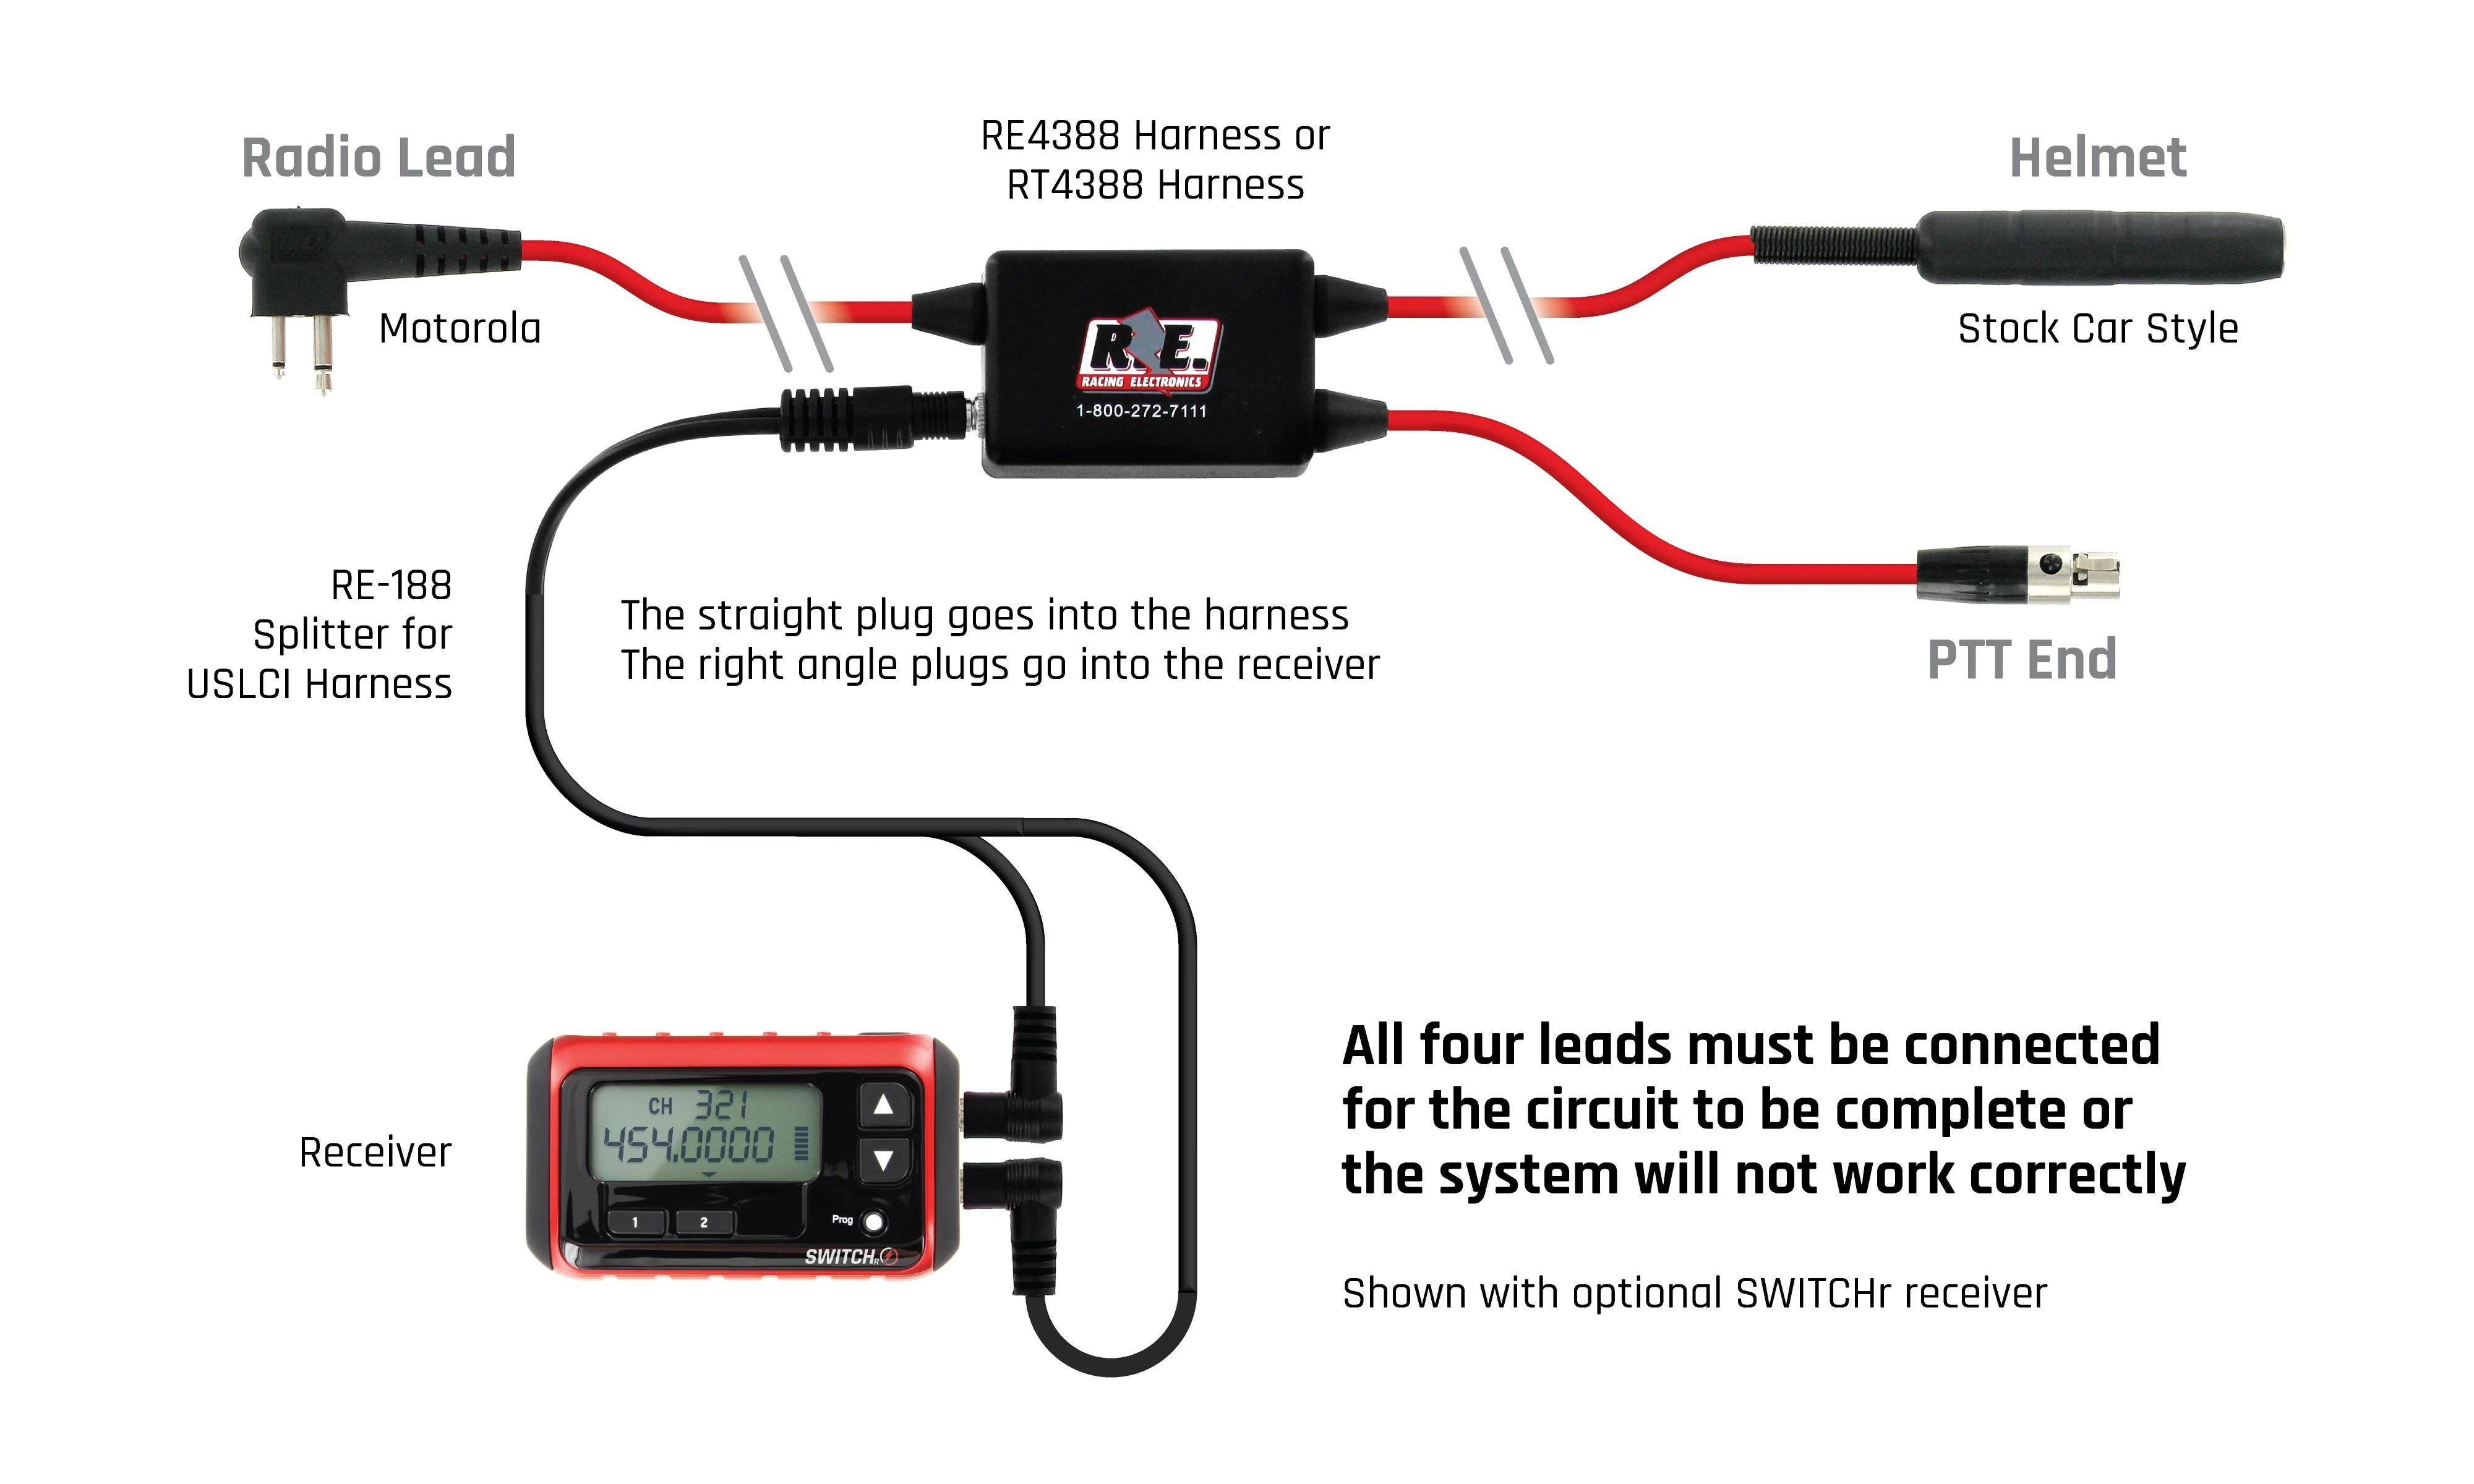 hight resolution of car harness 3 conductor racetrac 2 pin motorola uslci